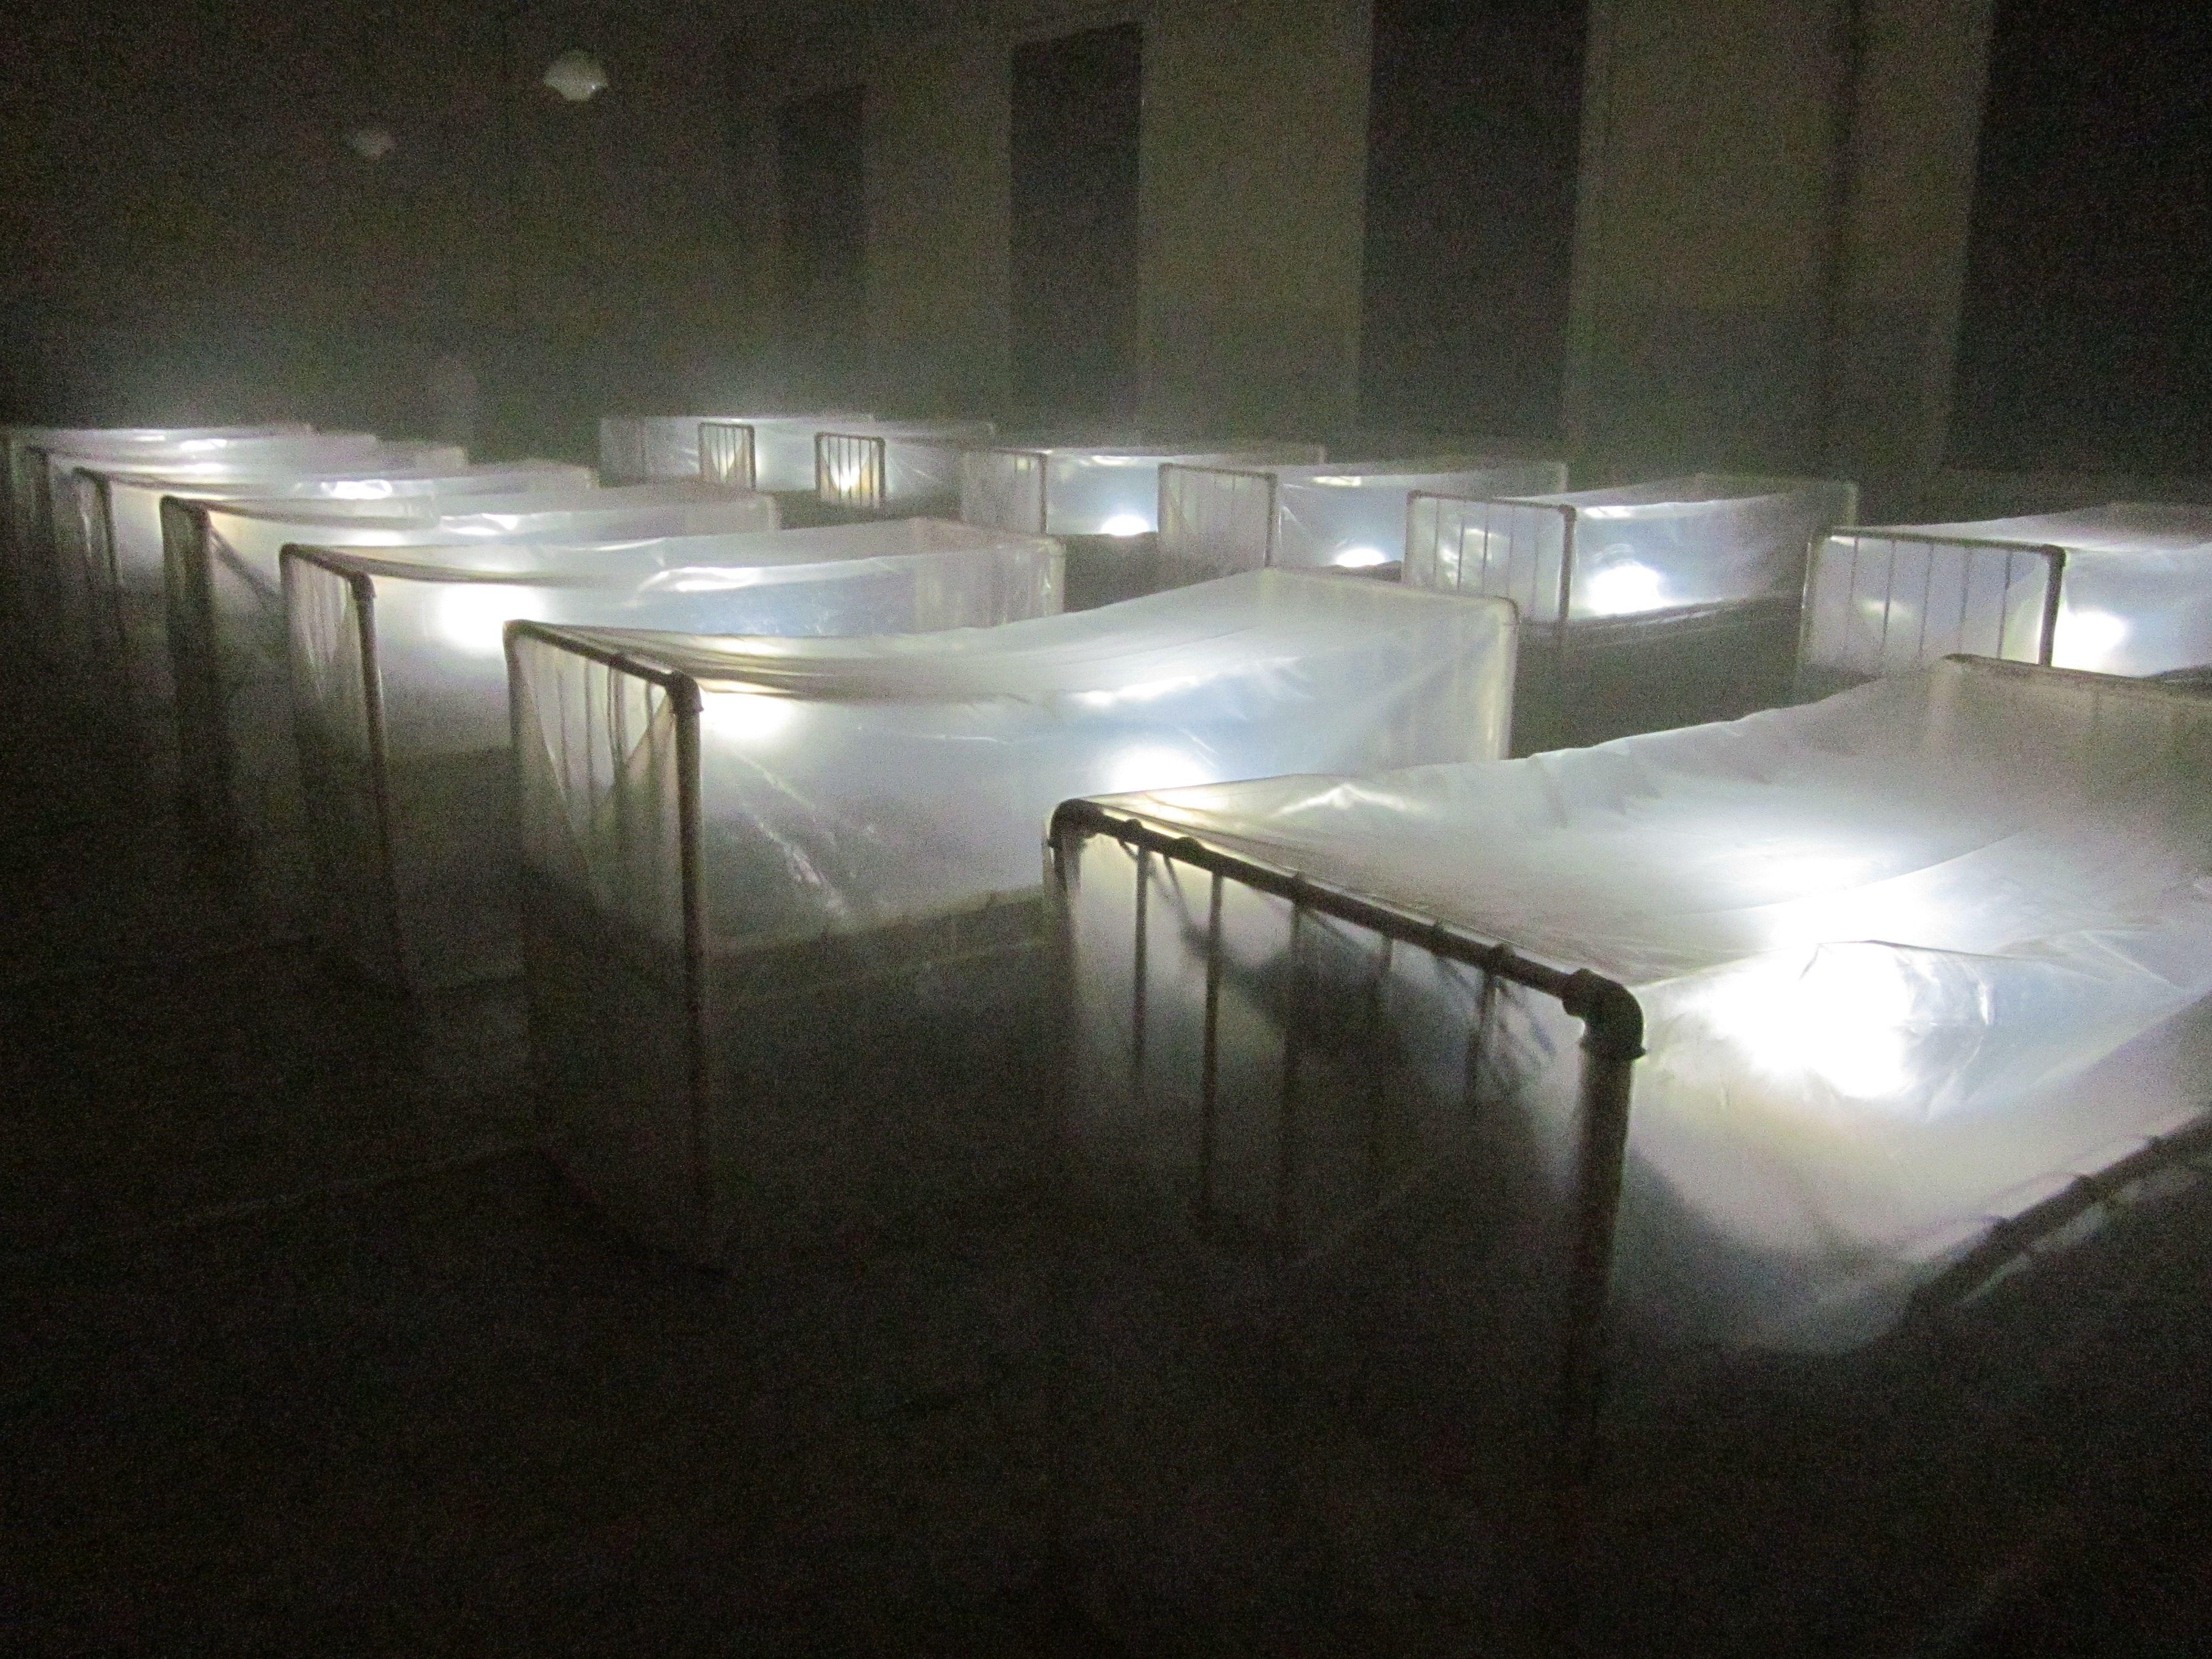 Christian Boltanski, Migrantes, 2012. Installation in Museo Hotel de Inmigrantes, Buenos Aires